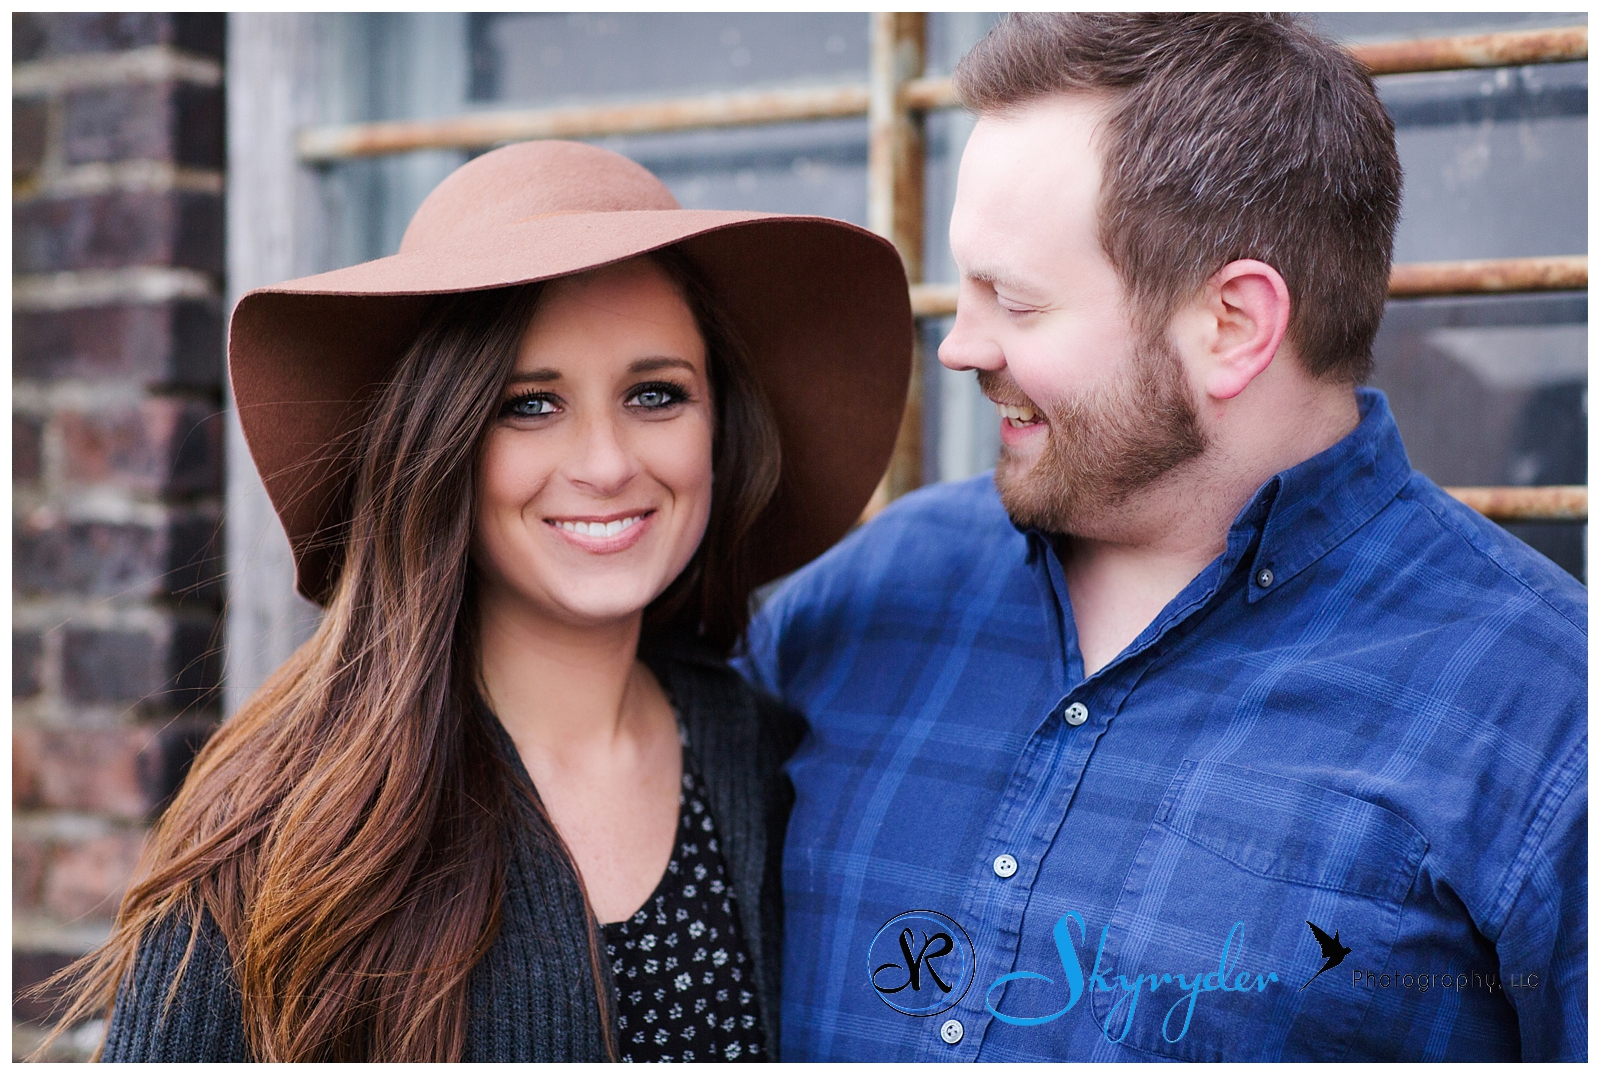 skyryder photography blacksburg wedding engagement photographer blacksburg vt virginia tech roanoke charlottesville radford lexington